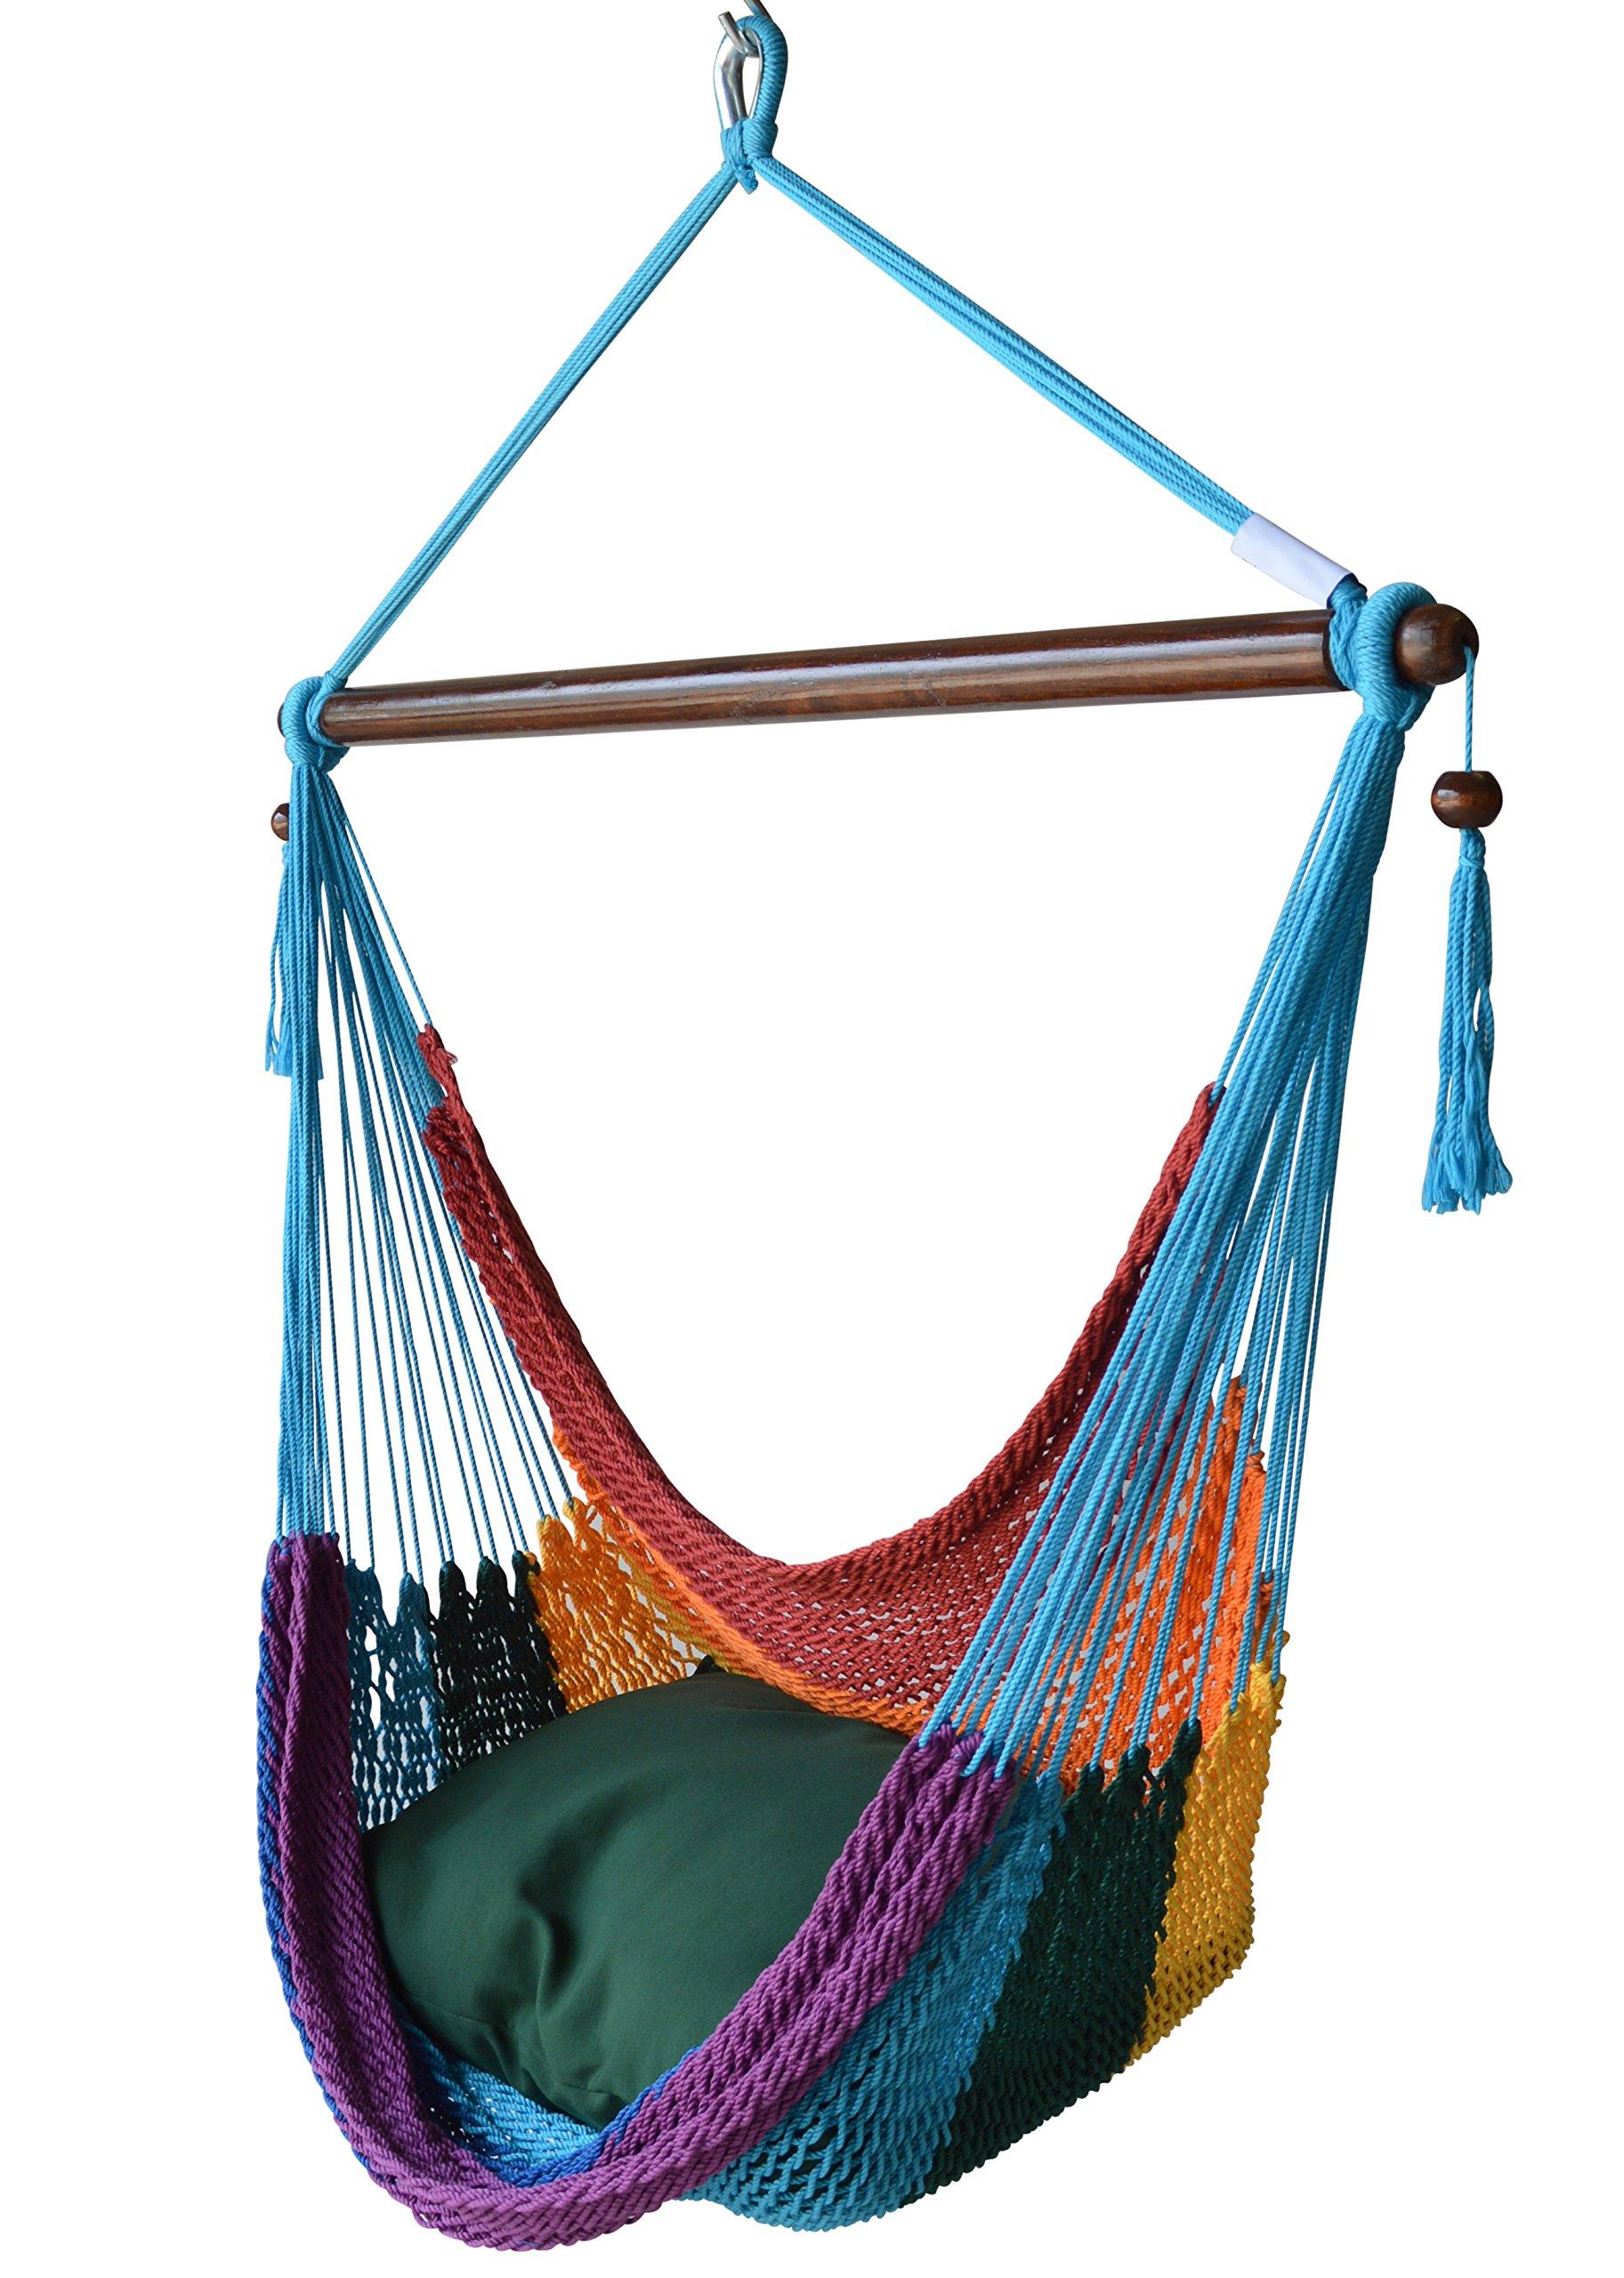 Caribbean Hammocks Chair with Footrest - 40 inch - Soft-Spun Polyester - (Rainbow)